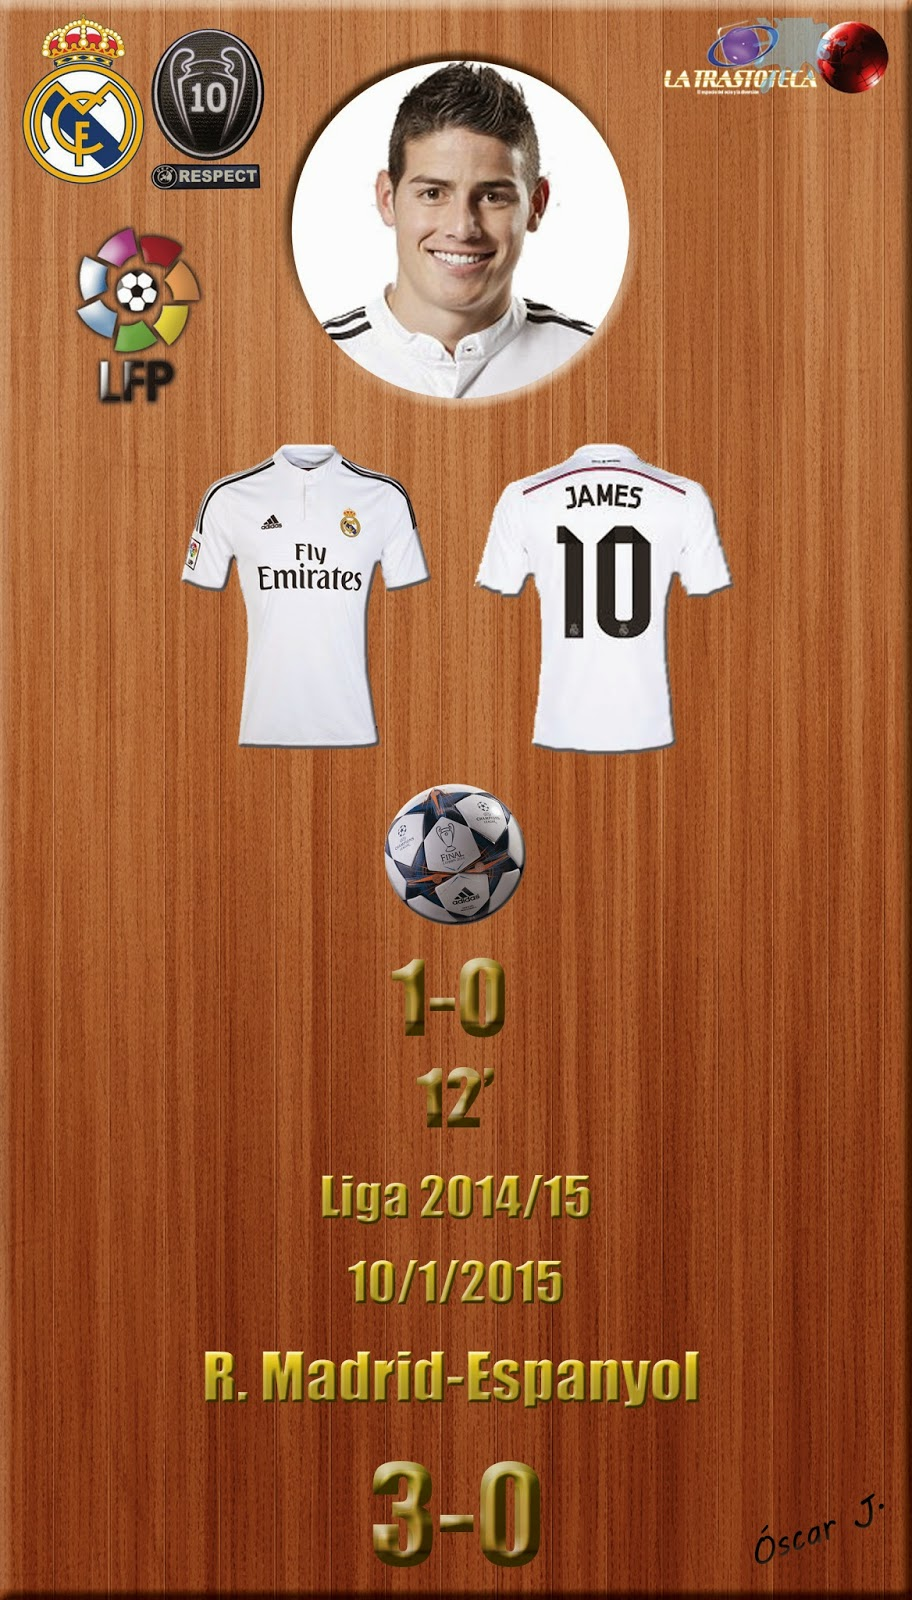 Real Madrid 3-0 Espanyol - Liga 2014/15 - Jornada 18 - (10/1/2015)